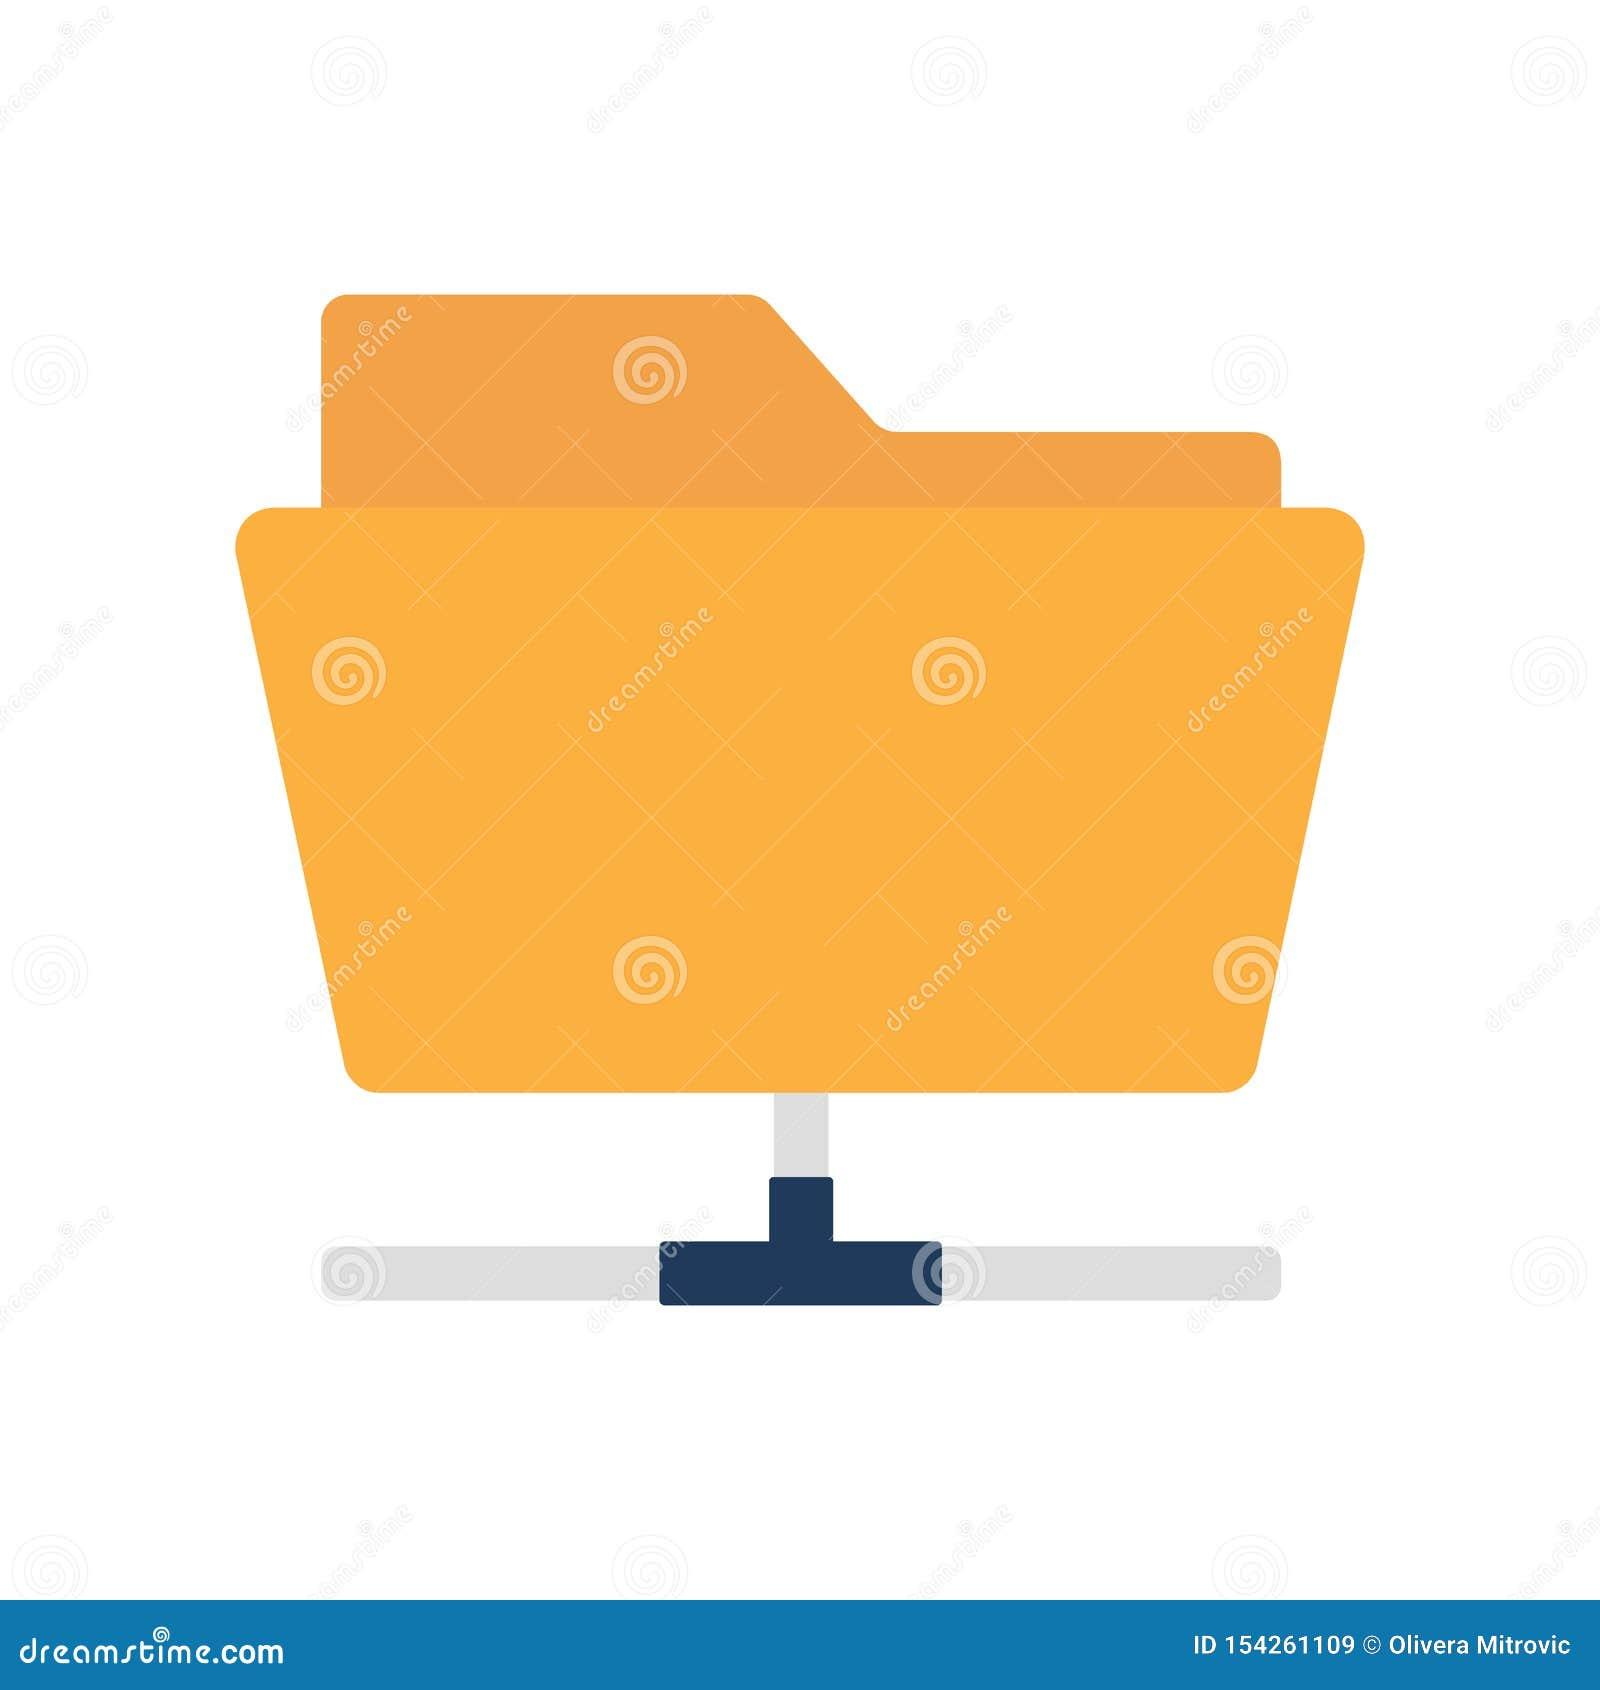 Flat icon sharing folder